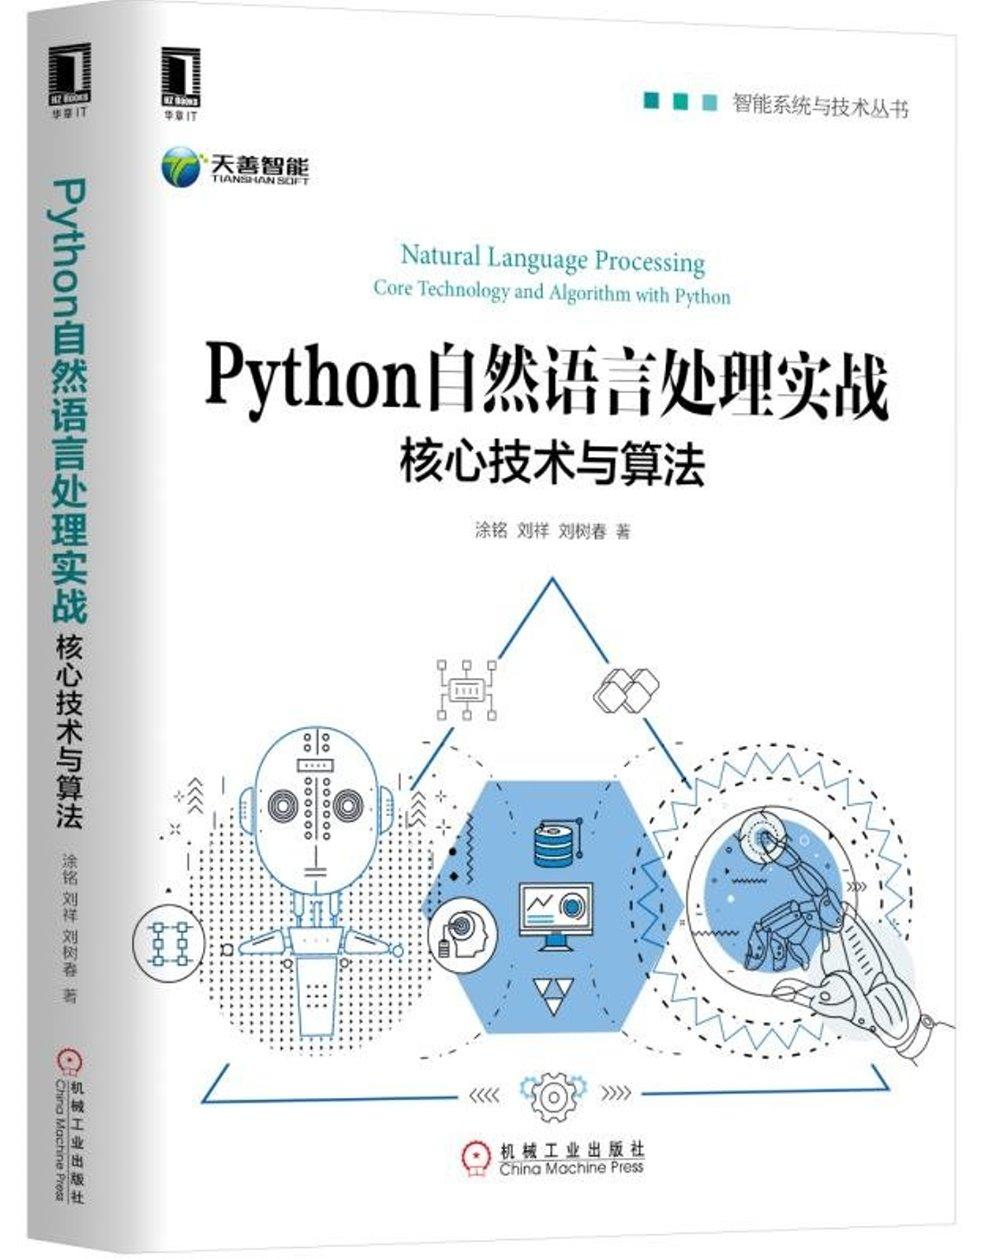 Python自然語言處理實戰:核心技術與演算法